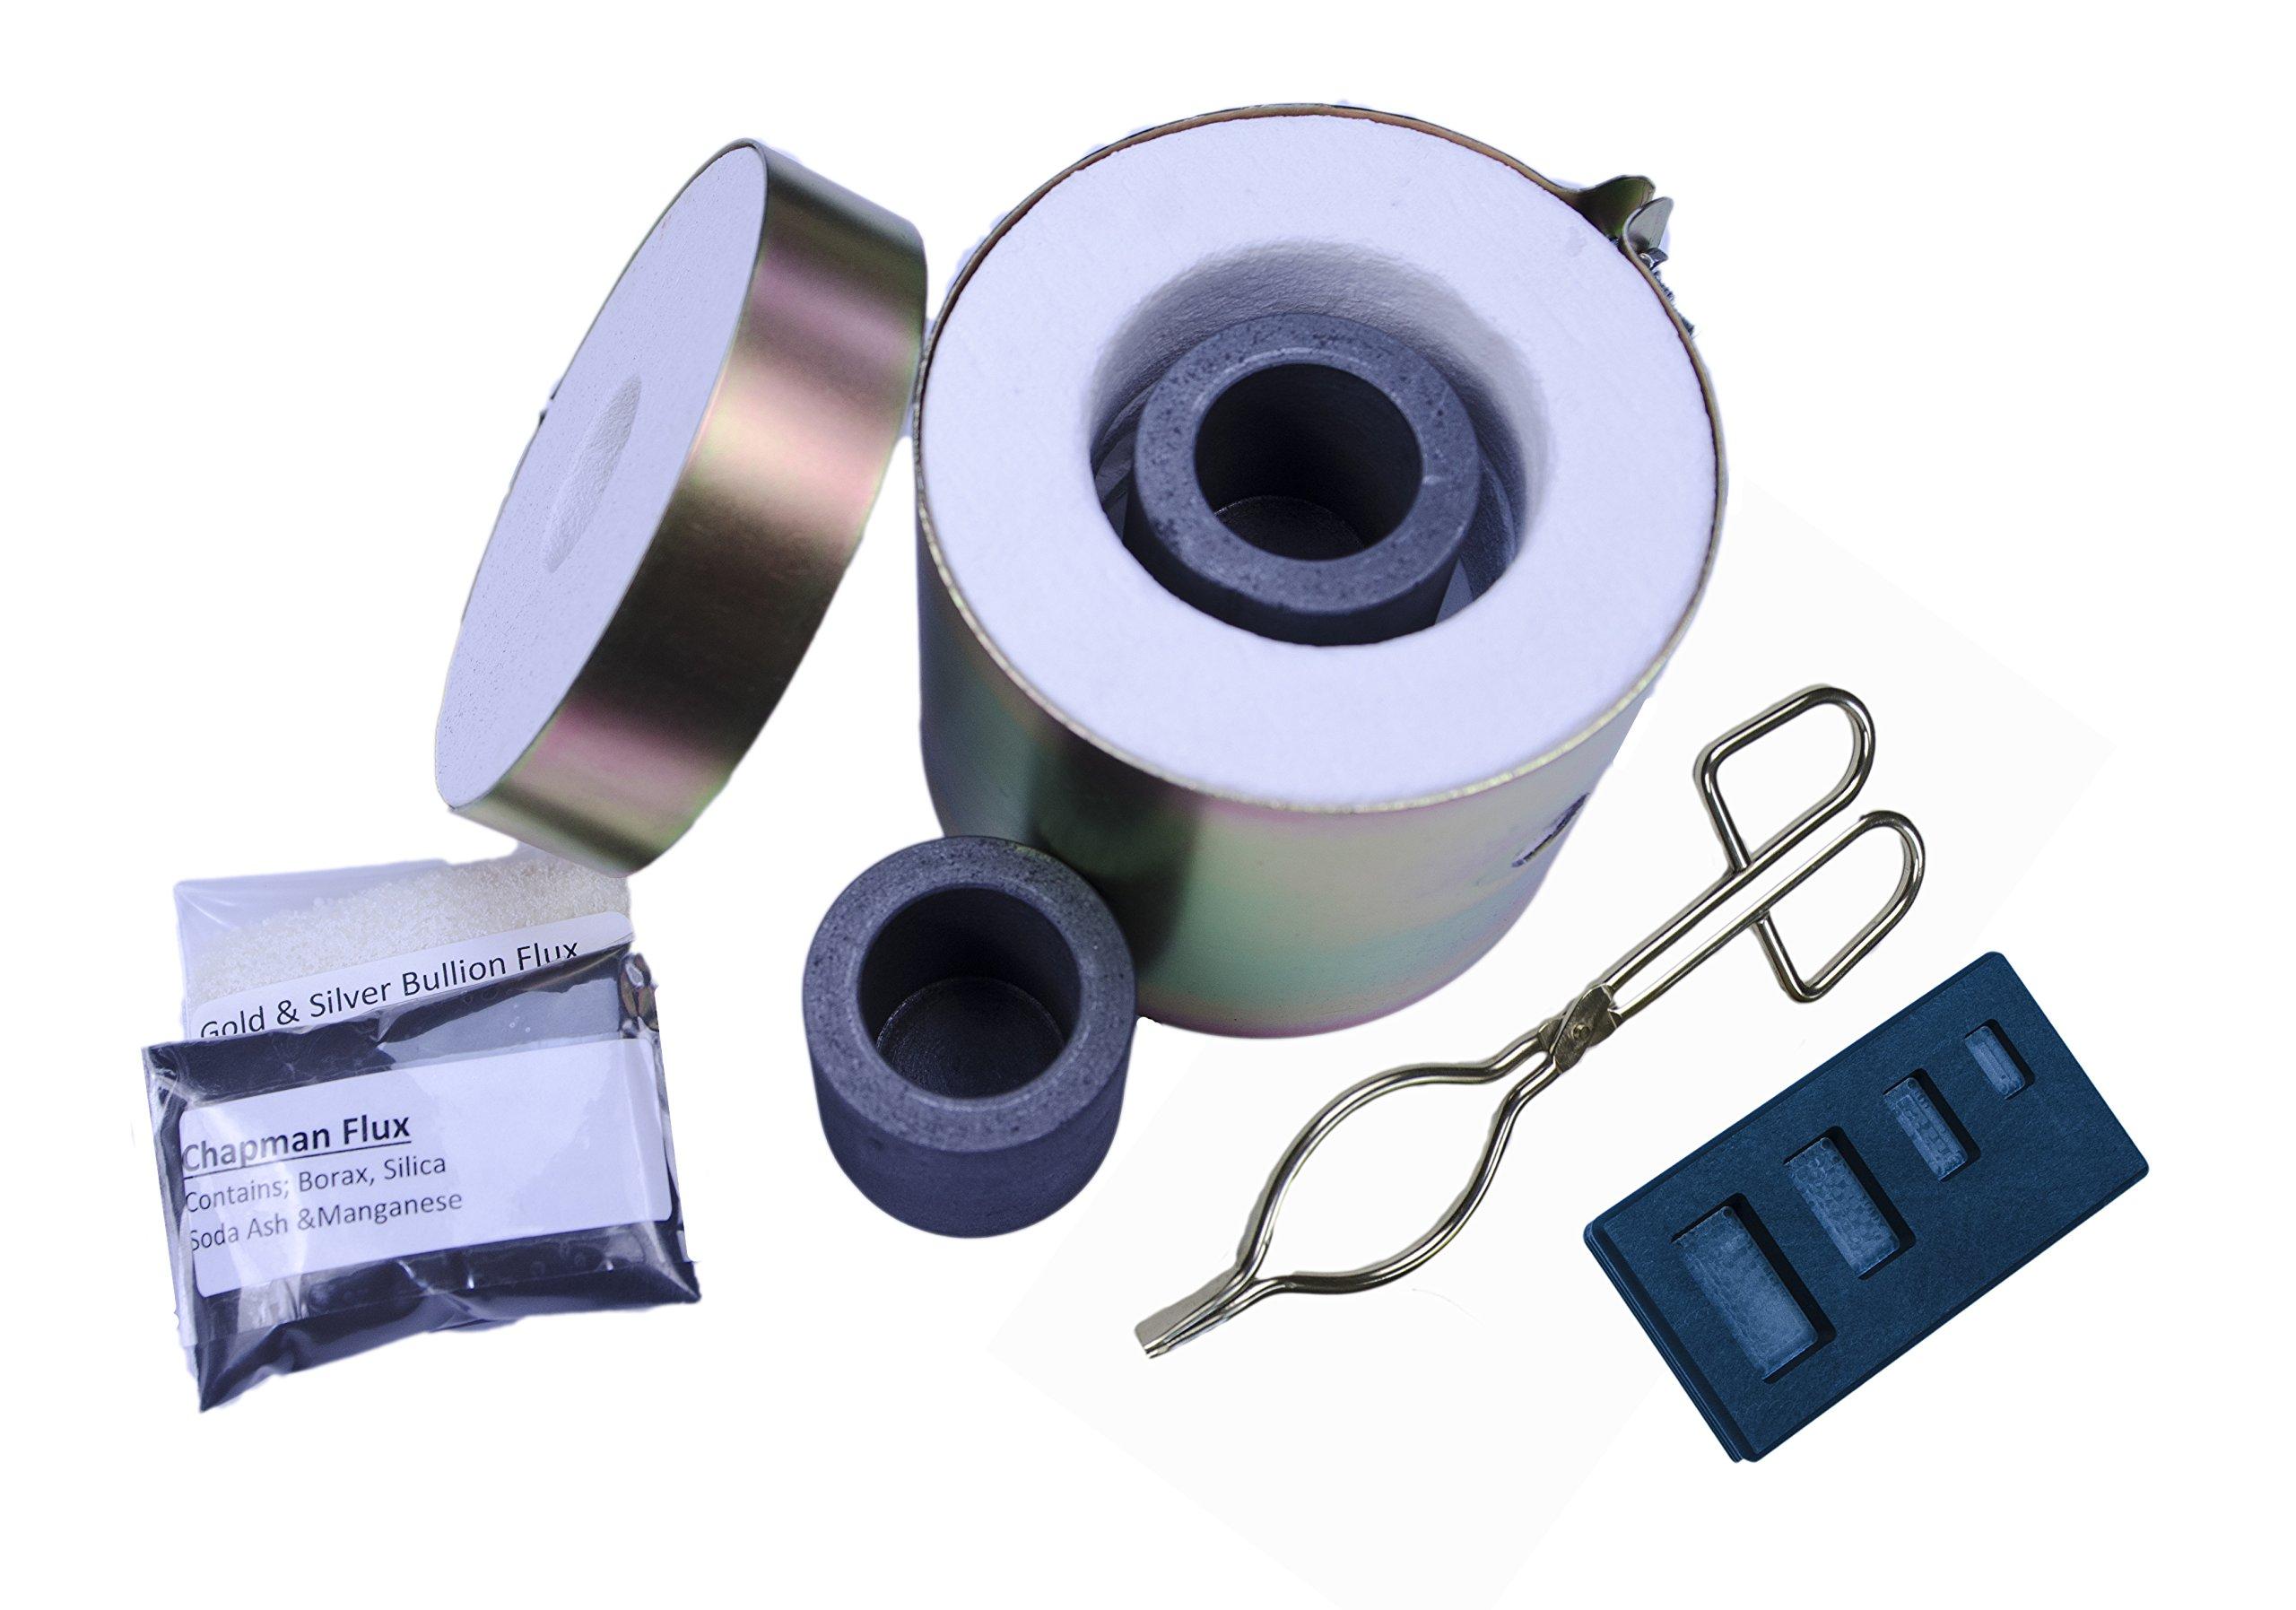 Gold & Silver Melting Kiln Tongs Crucibles 4 Cavity Mold Mini Propane Gas Furnace #4